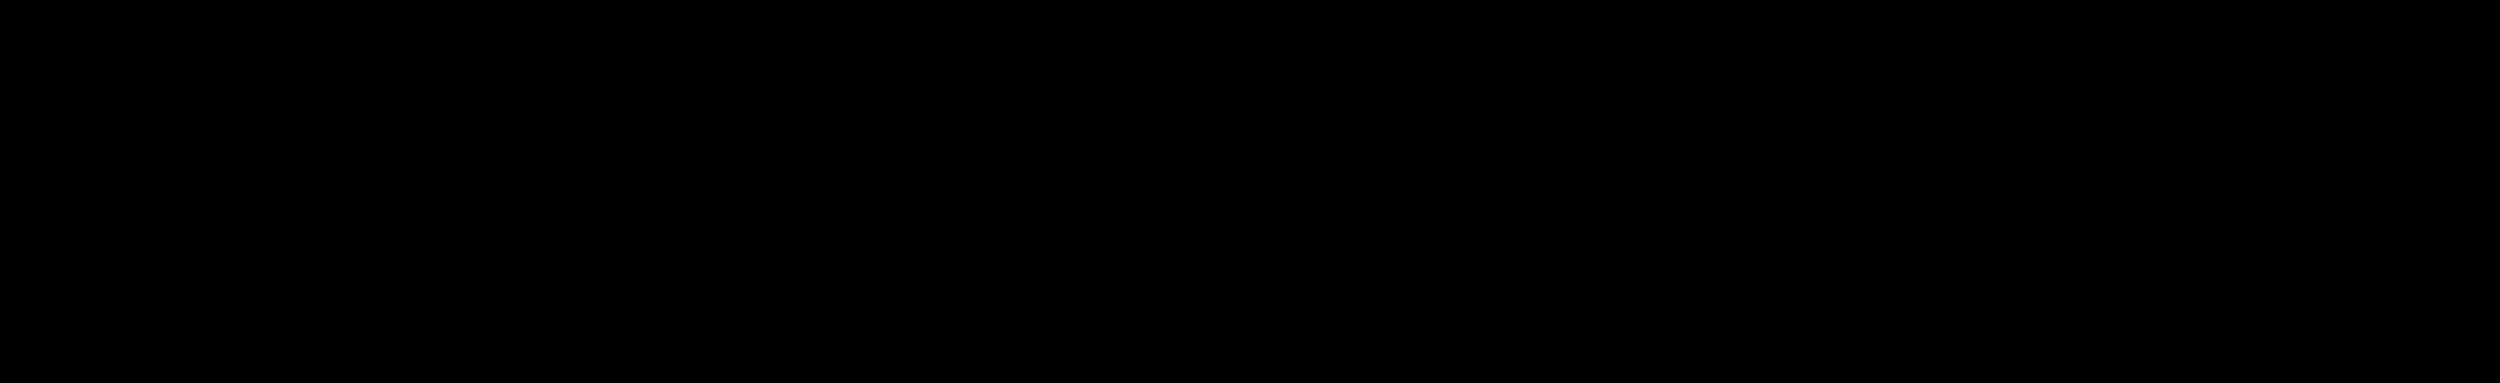 QF_Logos_01 Horizontal_Complete_Black.png